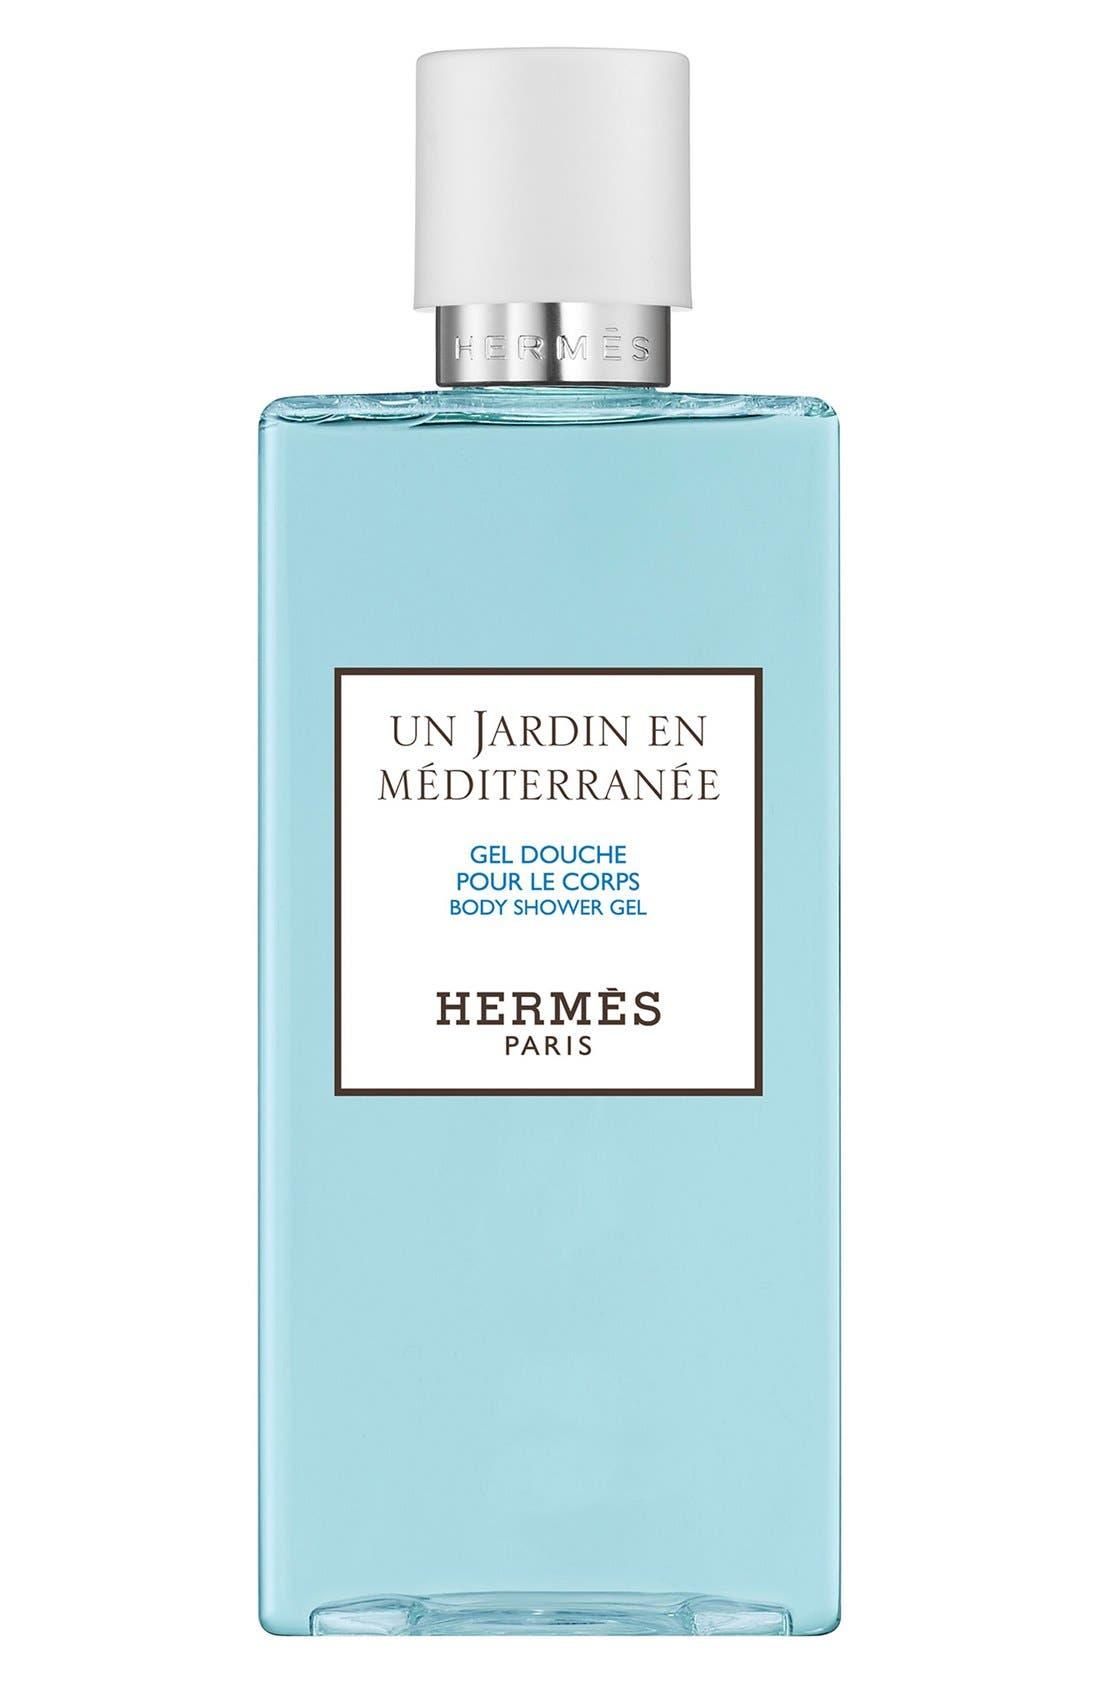 Hermès Le Jarden en Méditerranée - Body shower gel